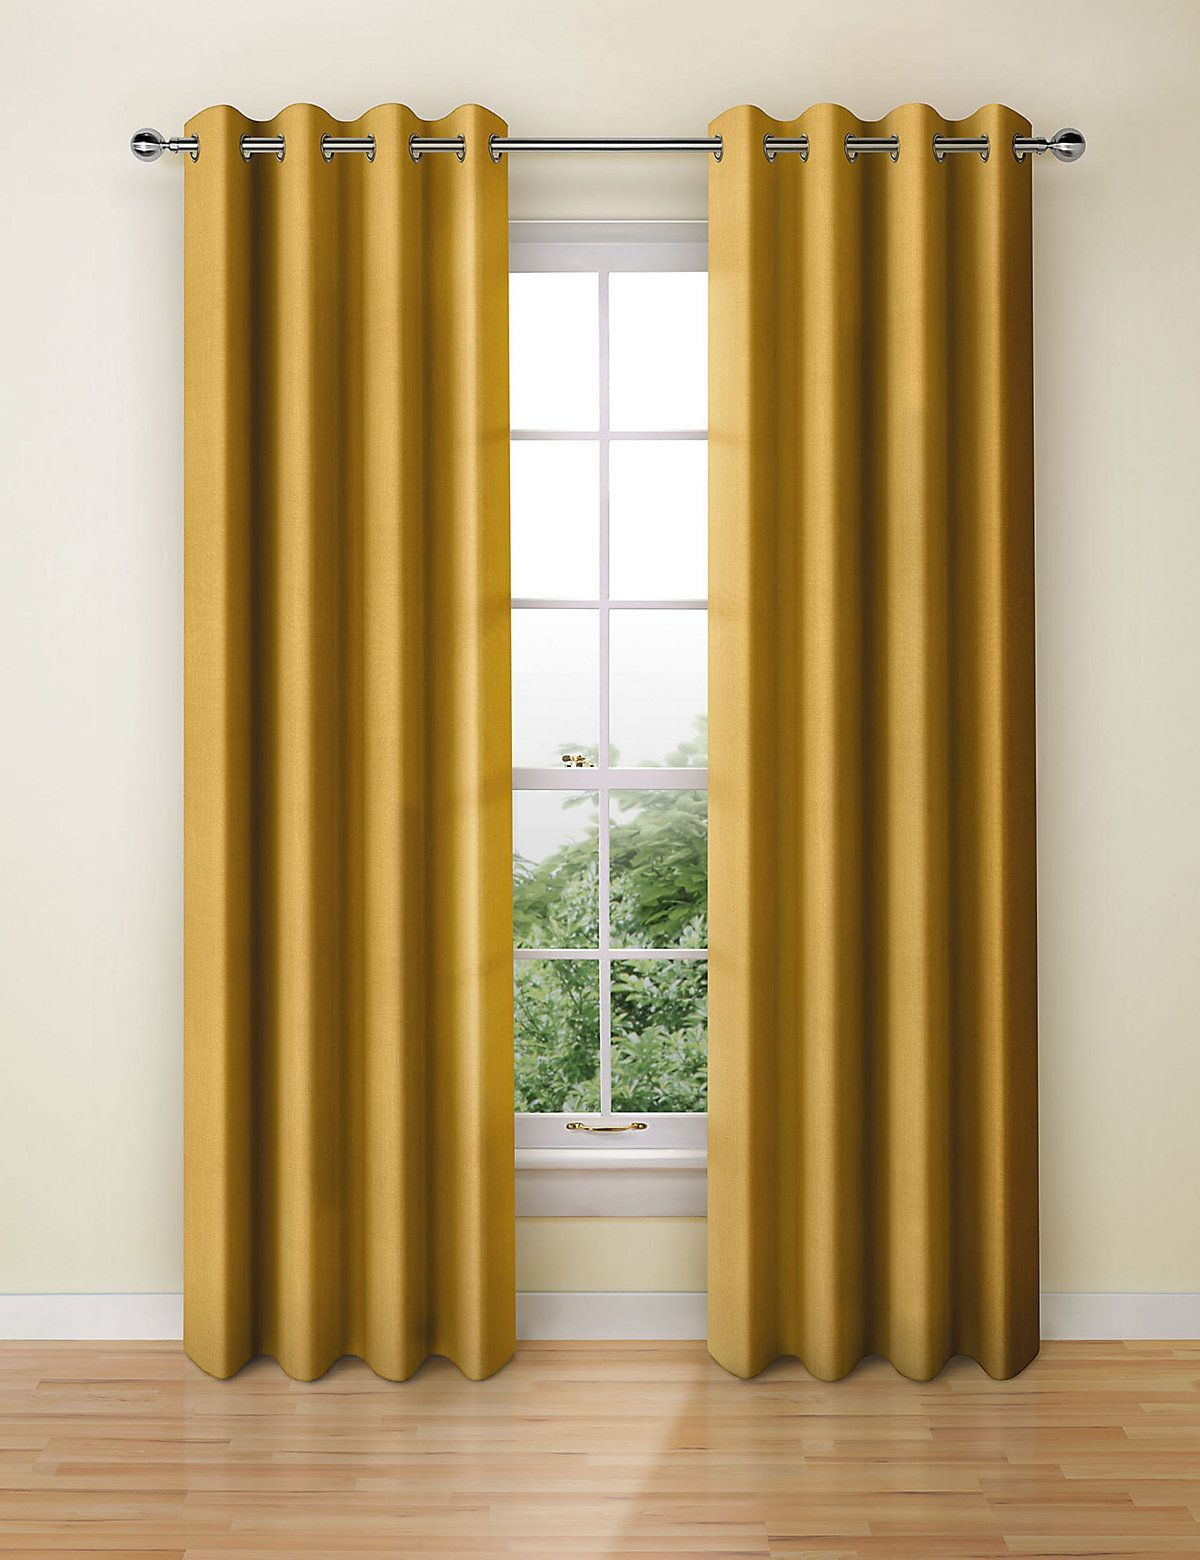 Pagectrlgedatame bedroomcurtainsgrey bedroom curtains grey